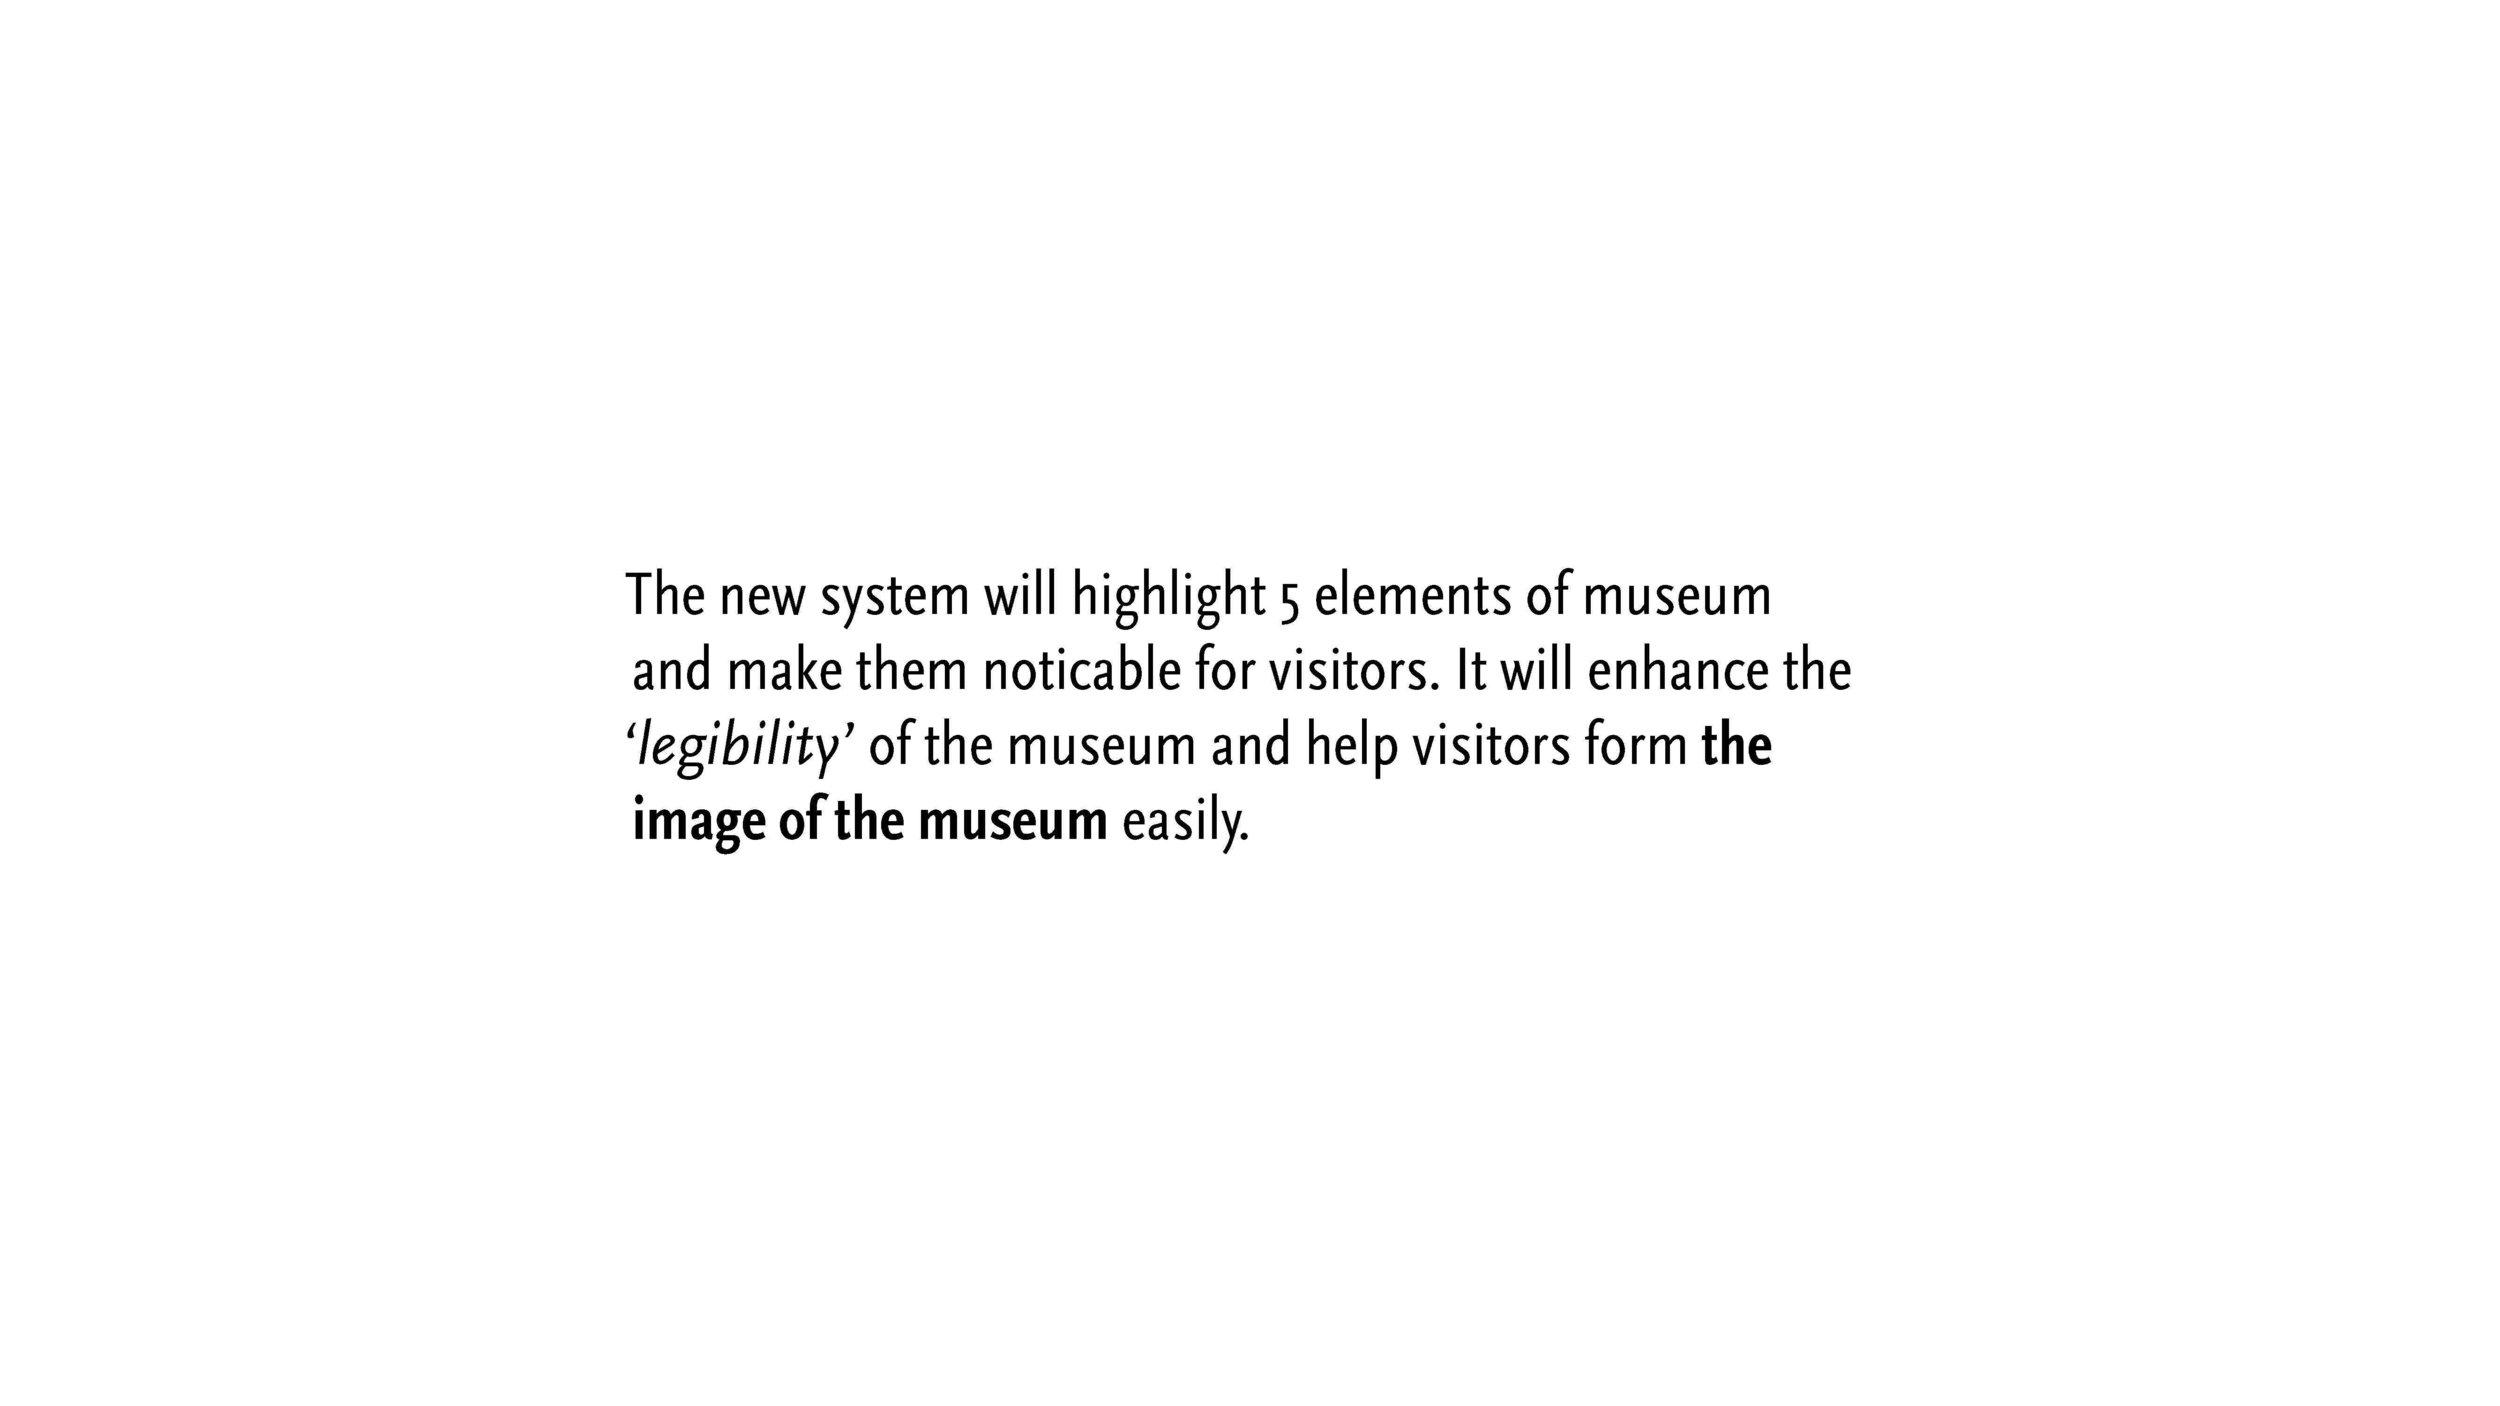 190519 AMNH Final Presentation_Page_11.jpg